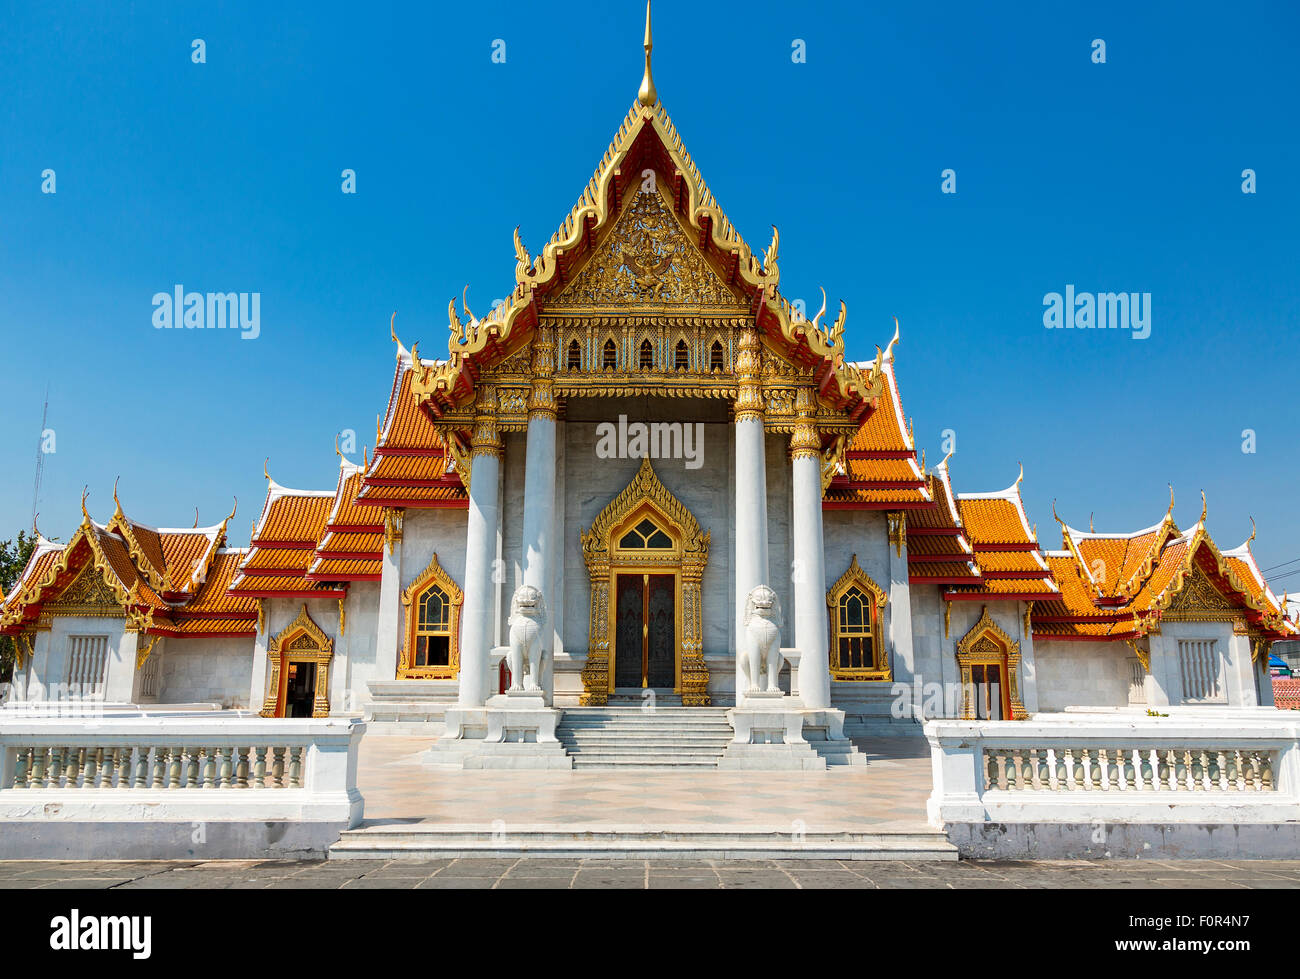 Thailandia, Bangkok, Wat Benchamabophit (tempio in marmo) Immagini Stock